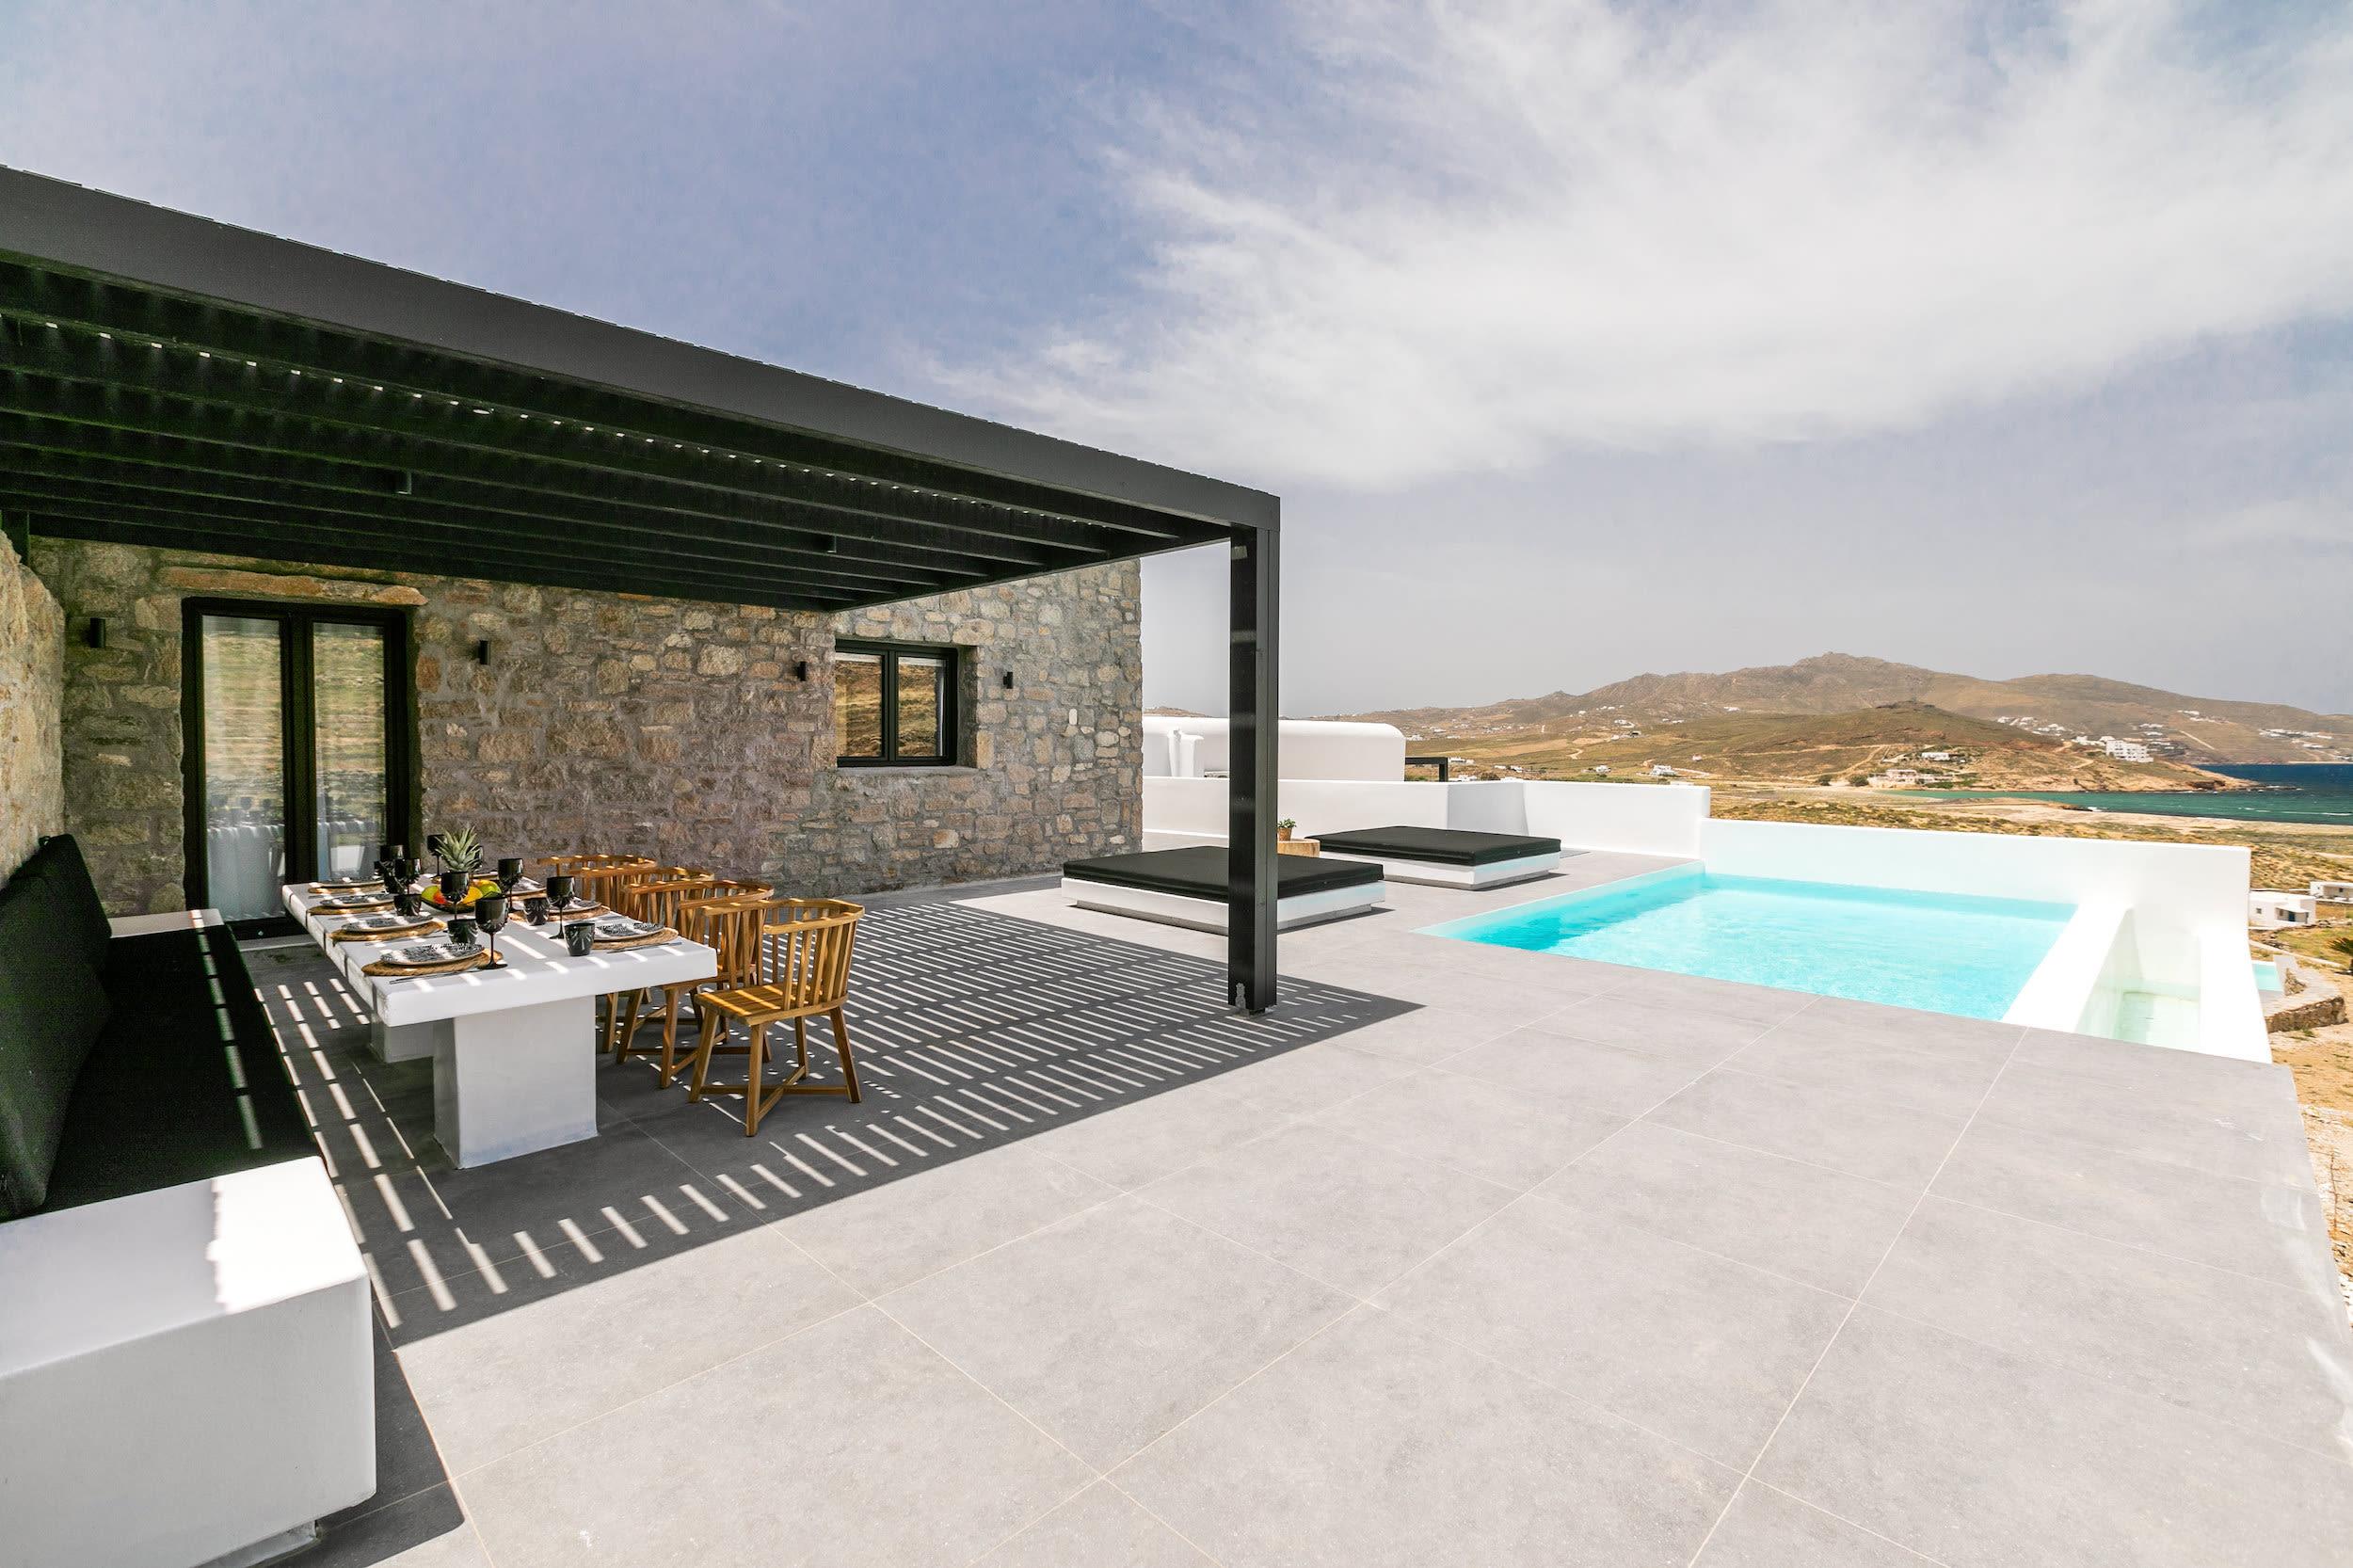 Luxury vacation rentals europe - Greece - Mykonos - Ftelia  - Villa Iremia - Image 1/16